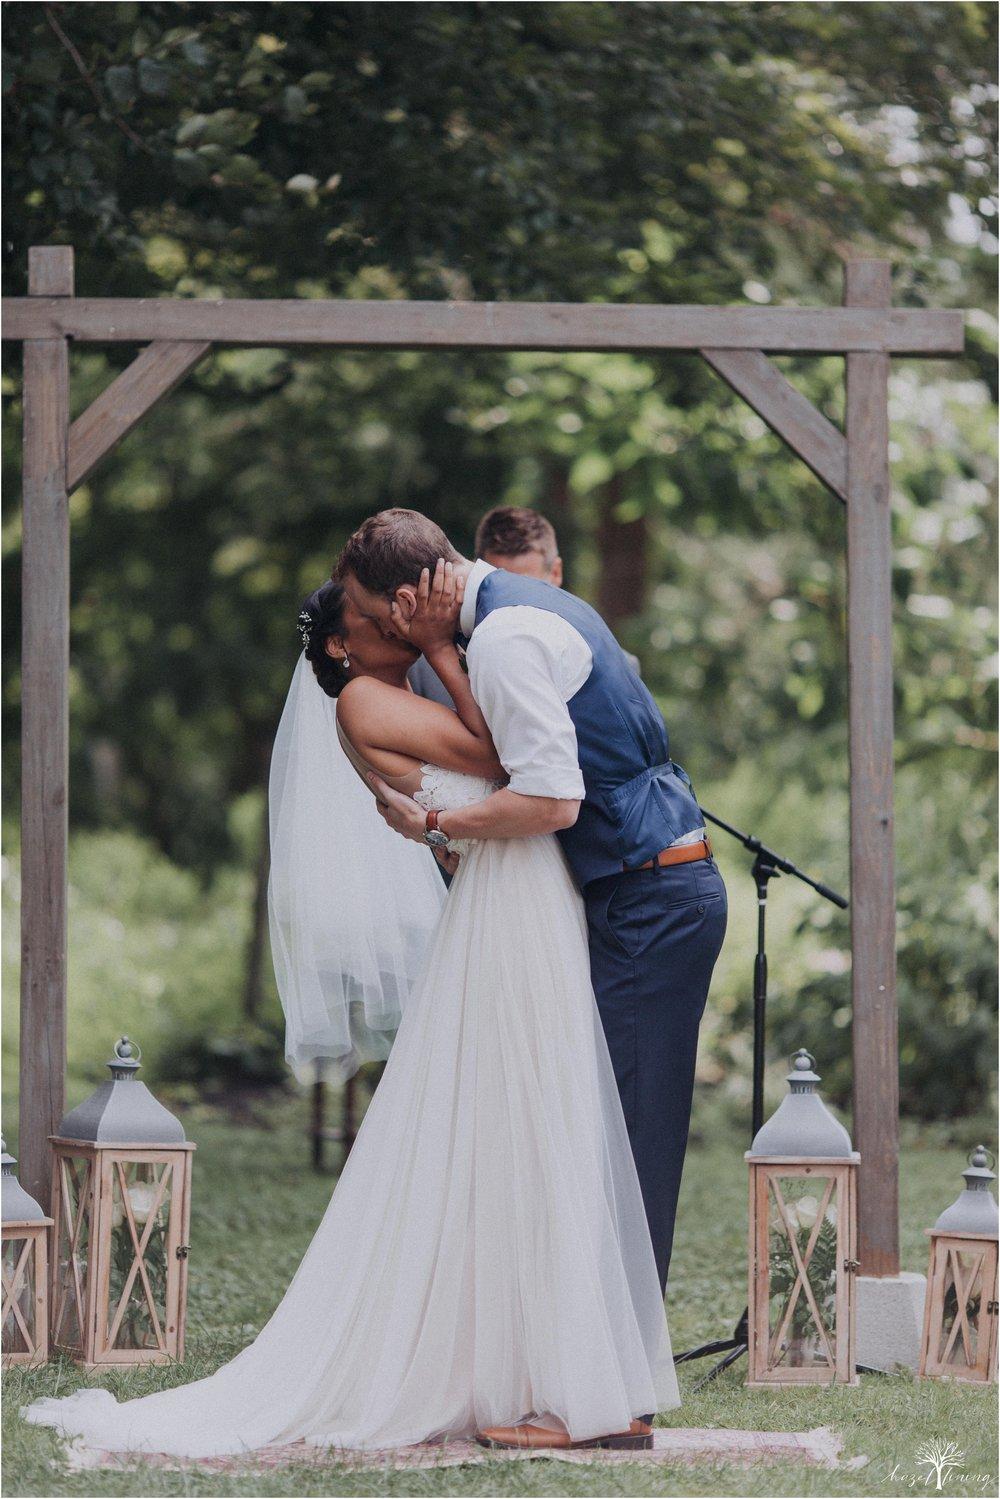 mariah-kreyling-samuel-sherratt-sherrattwiththeworld-peirce-farm-at-witch-hill-boston-massachusetts-wedding-photography-hazel-lining-travel-wedding-elopement-photography_0099.jpg